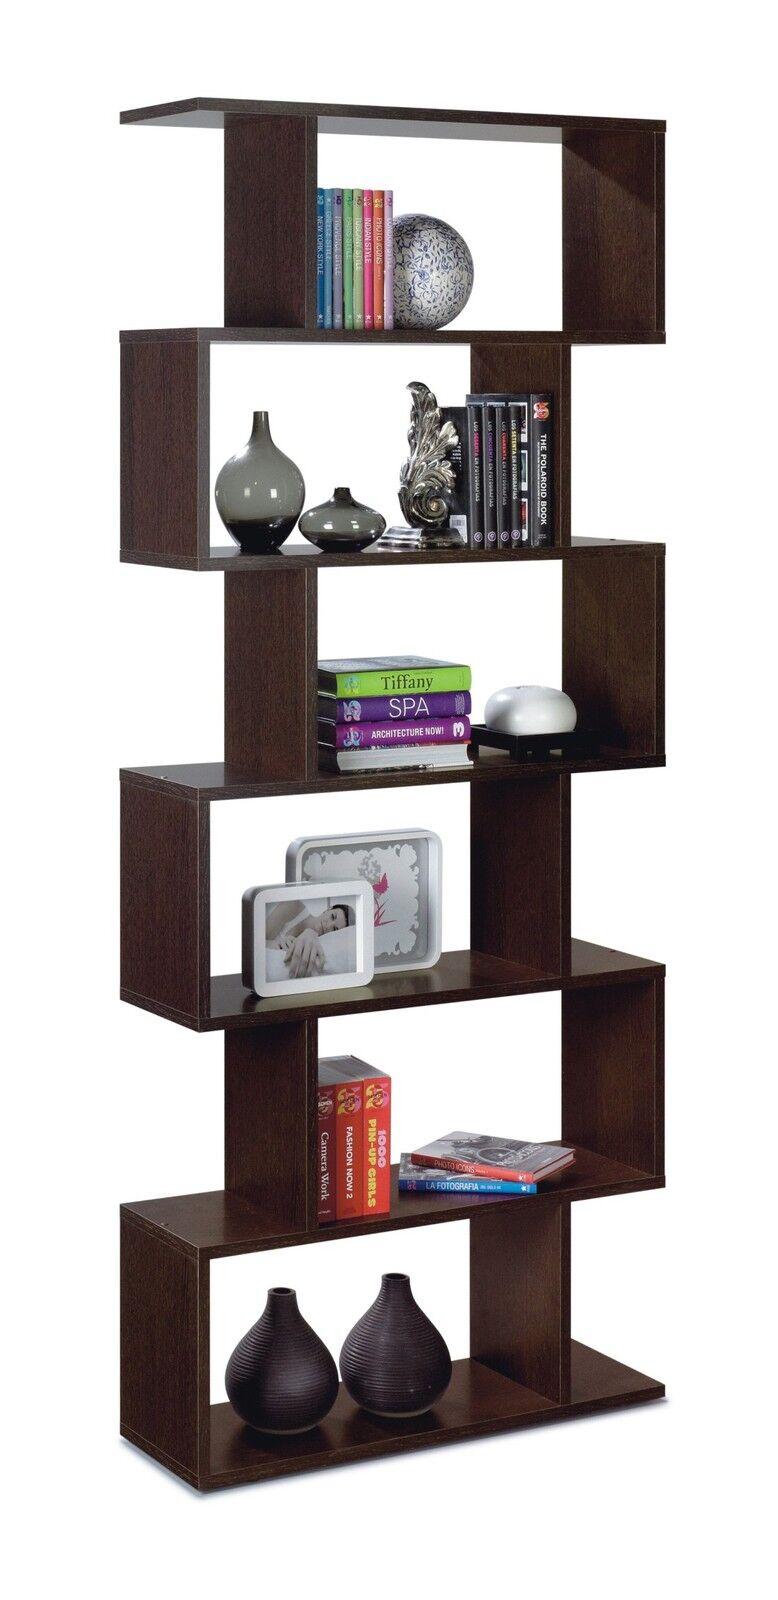 Gloss Black, White, Brown Room Divider Bookcase Lounge